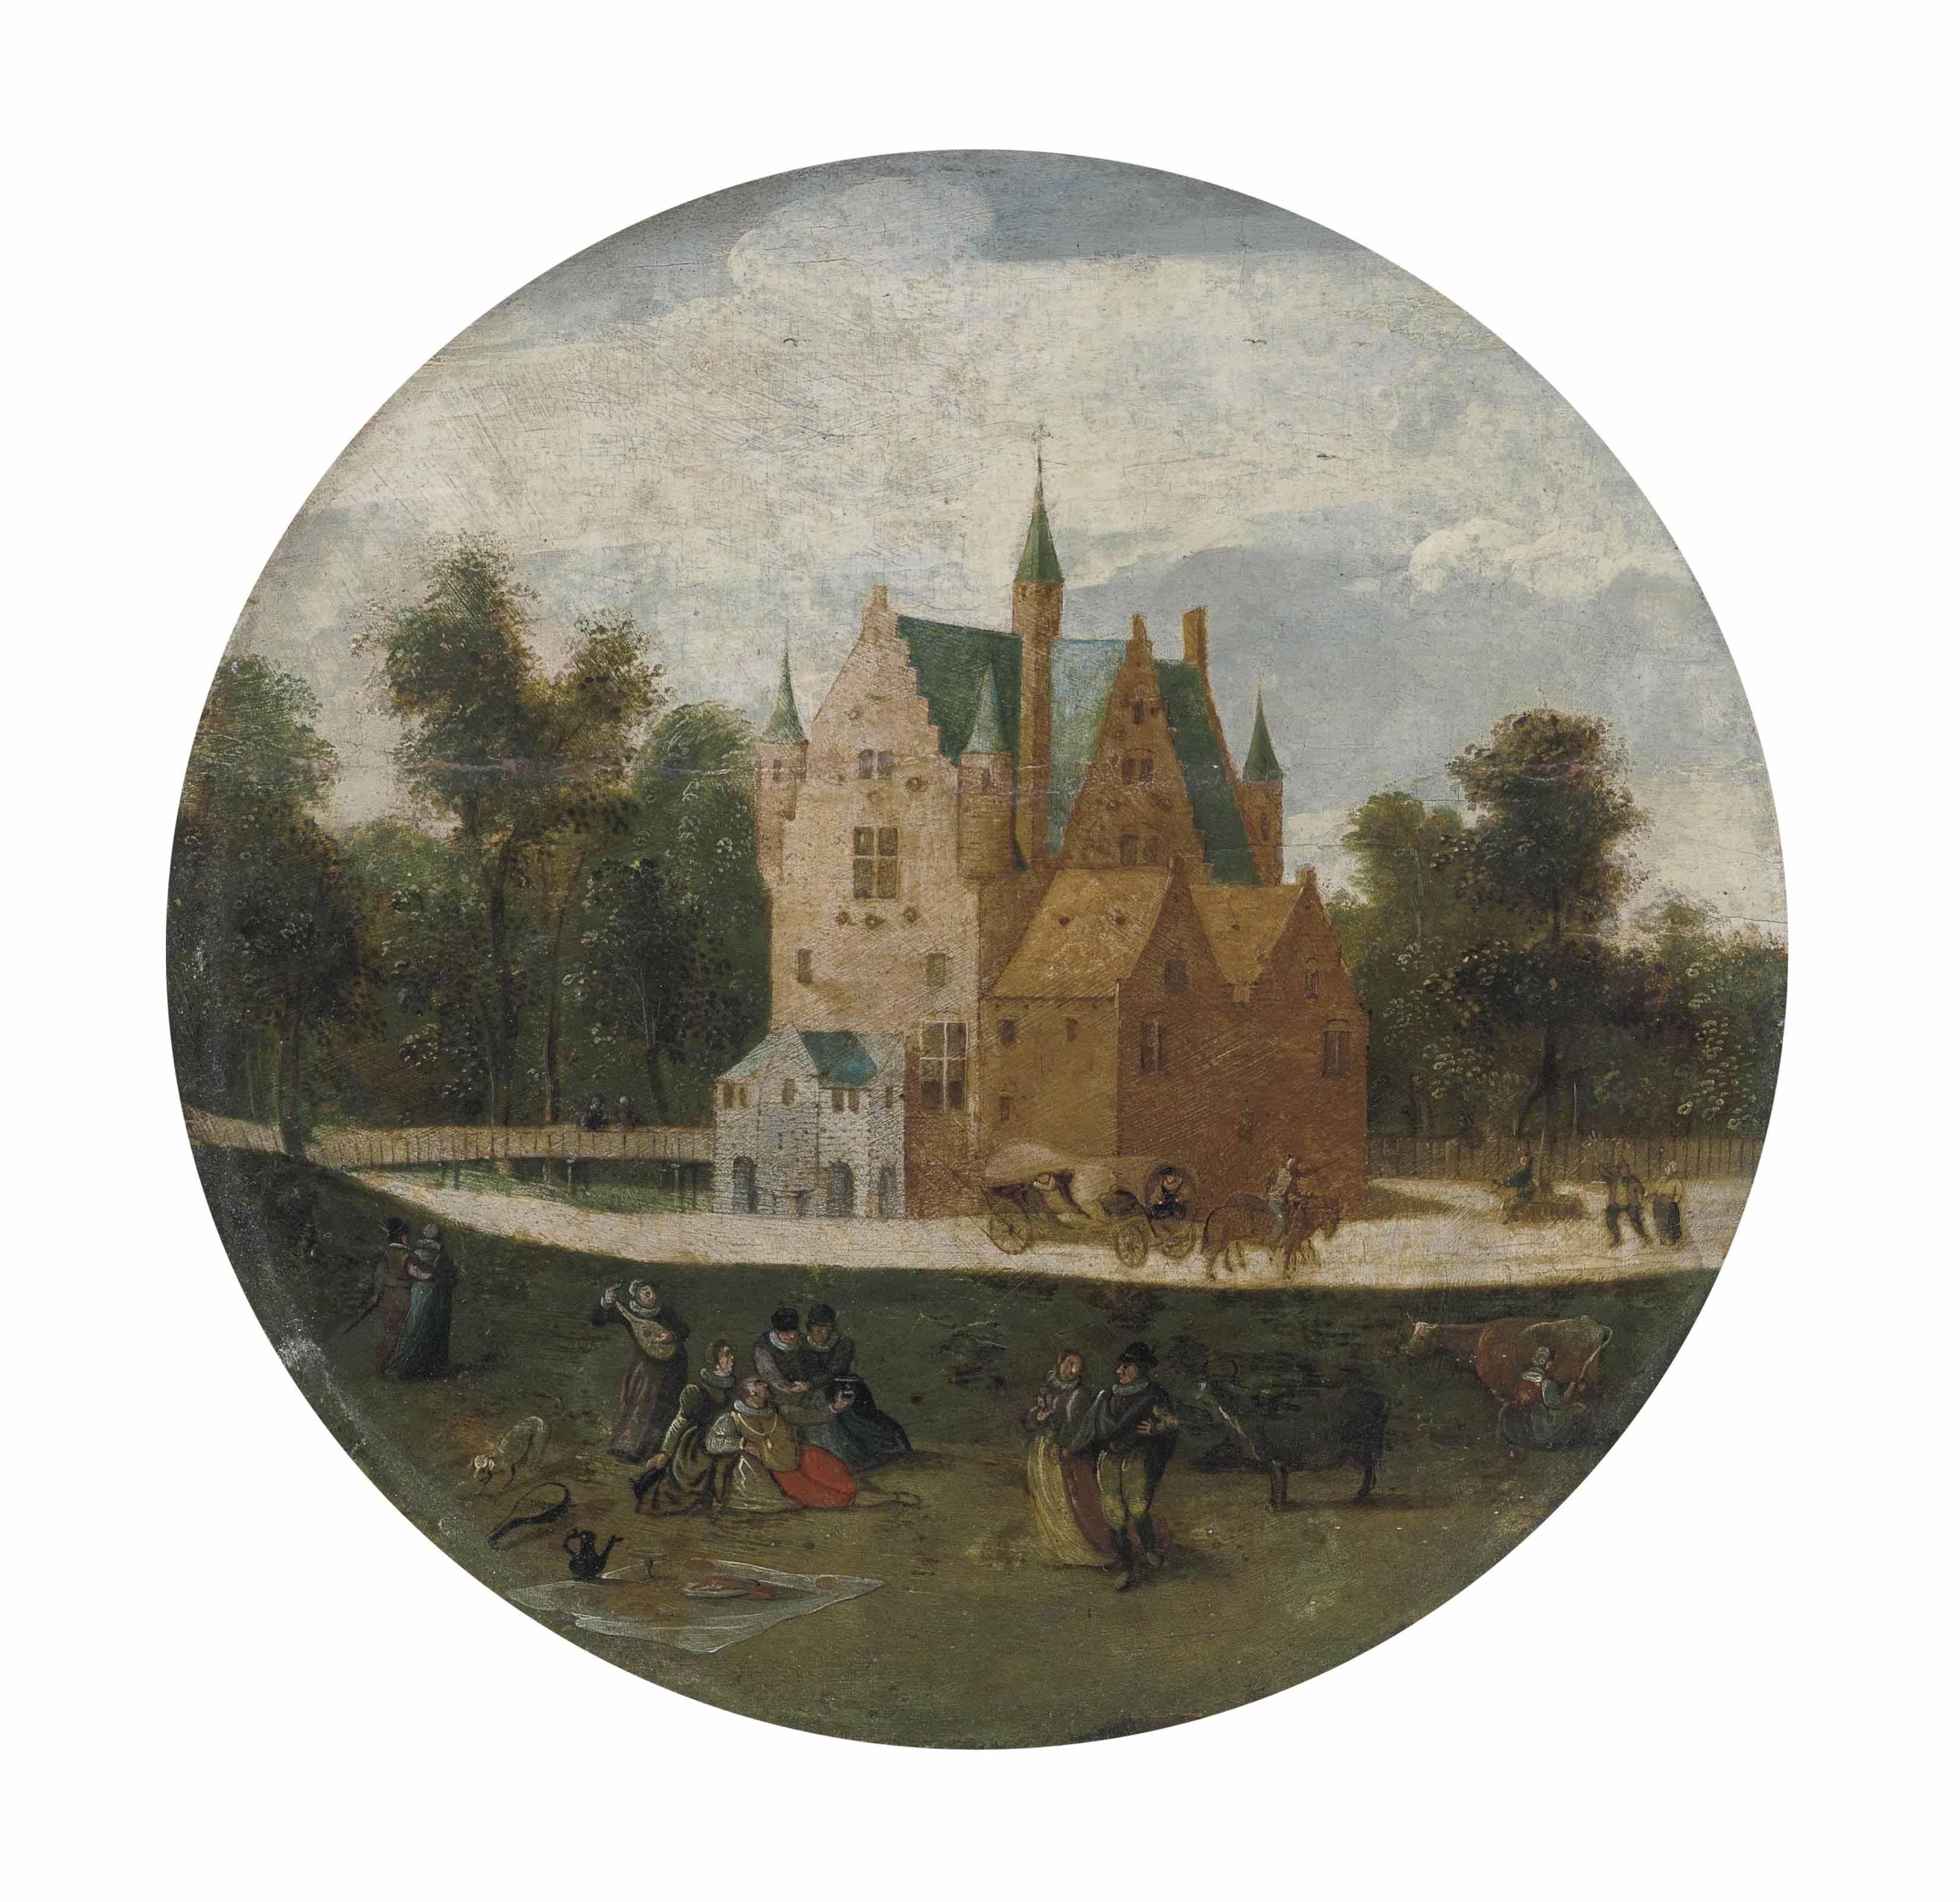 Abel Grimmer (Antwerp c. 1570-